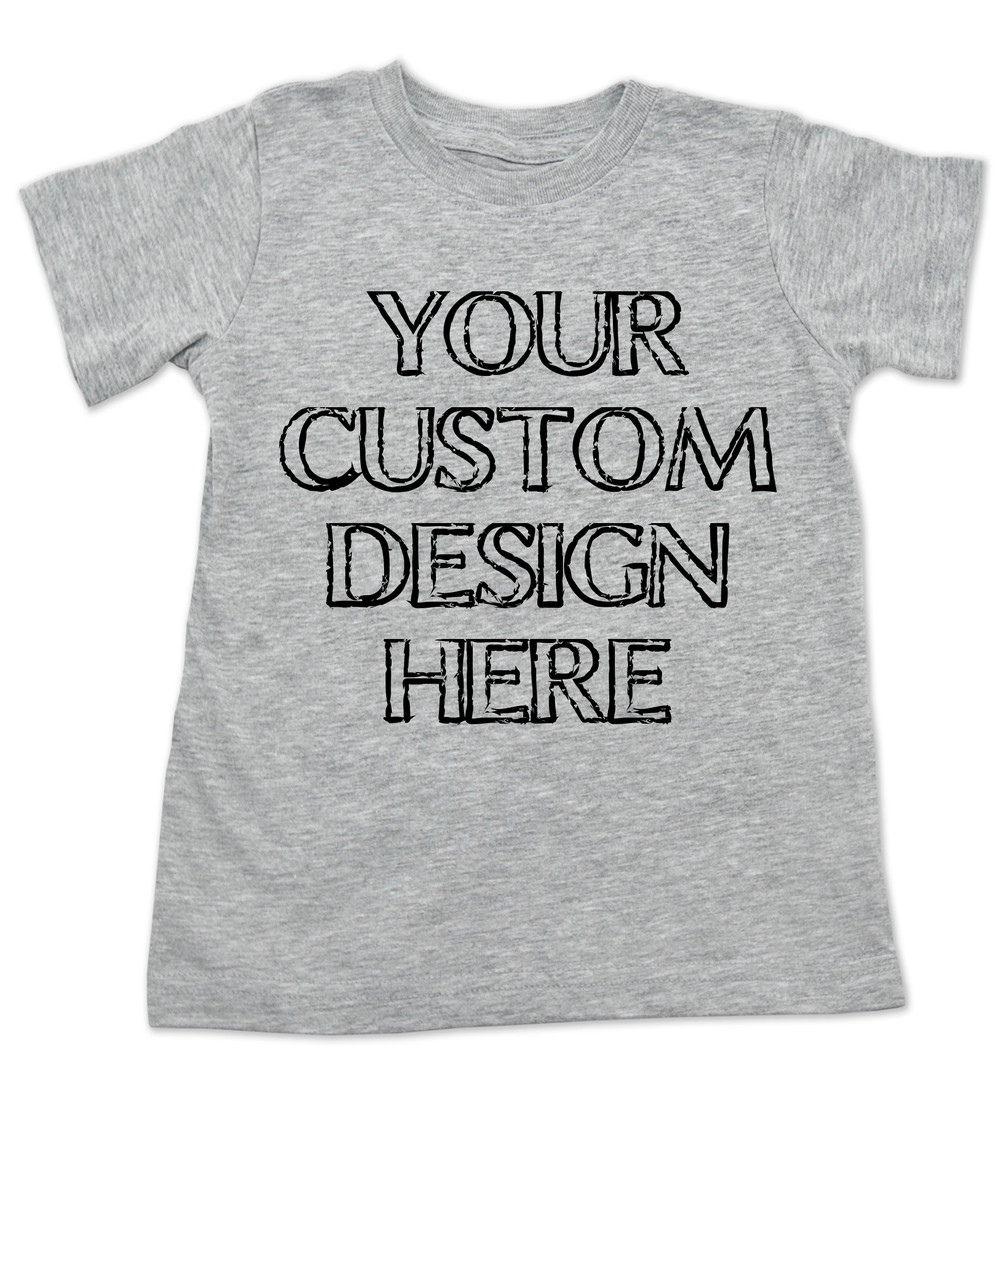 9f8cde021583b Make Your Own Custom Toddler Shirt